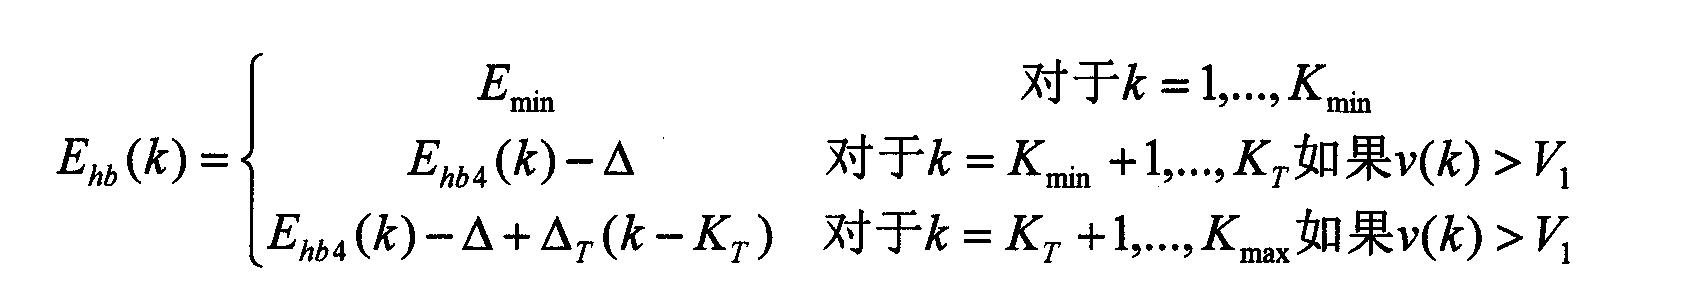 Figure CN102308333AD00122